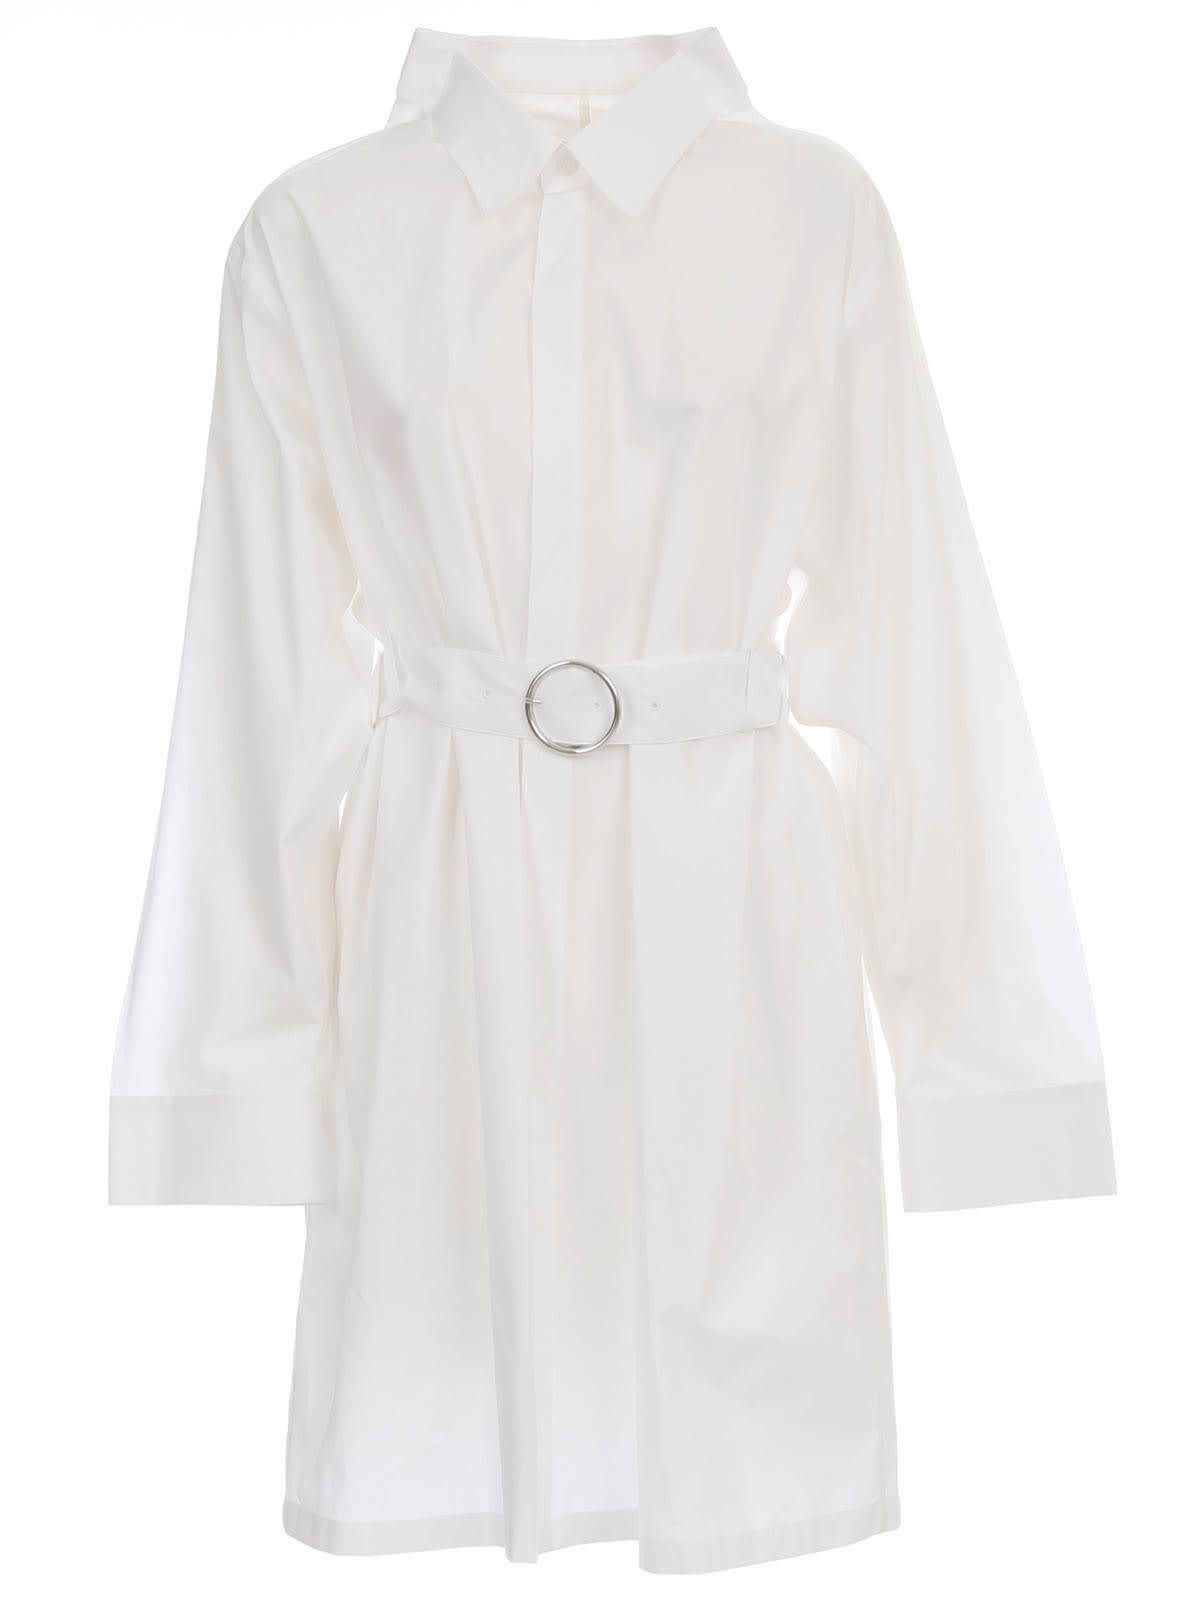 Buy Maison Margiela Dress L/s Cotton Popeline online, shop Maison Margiela with free shipping